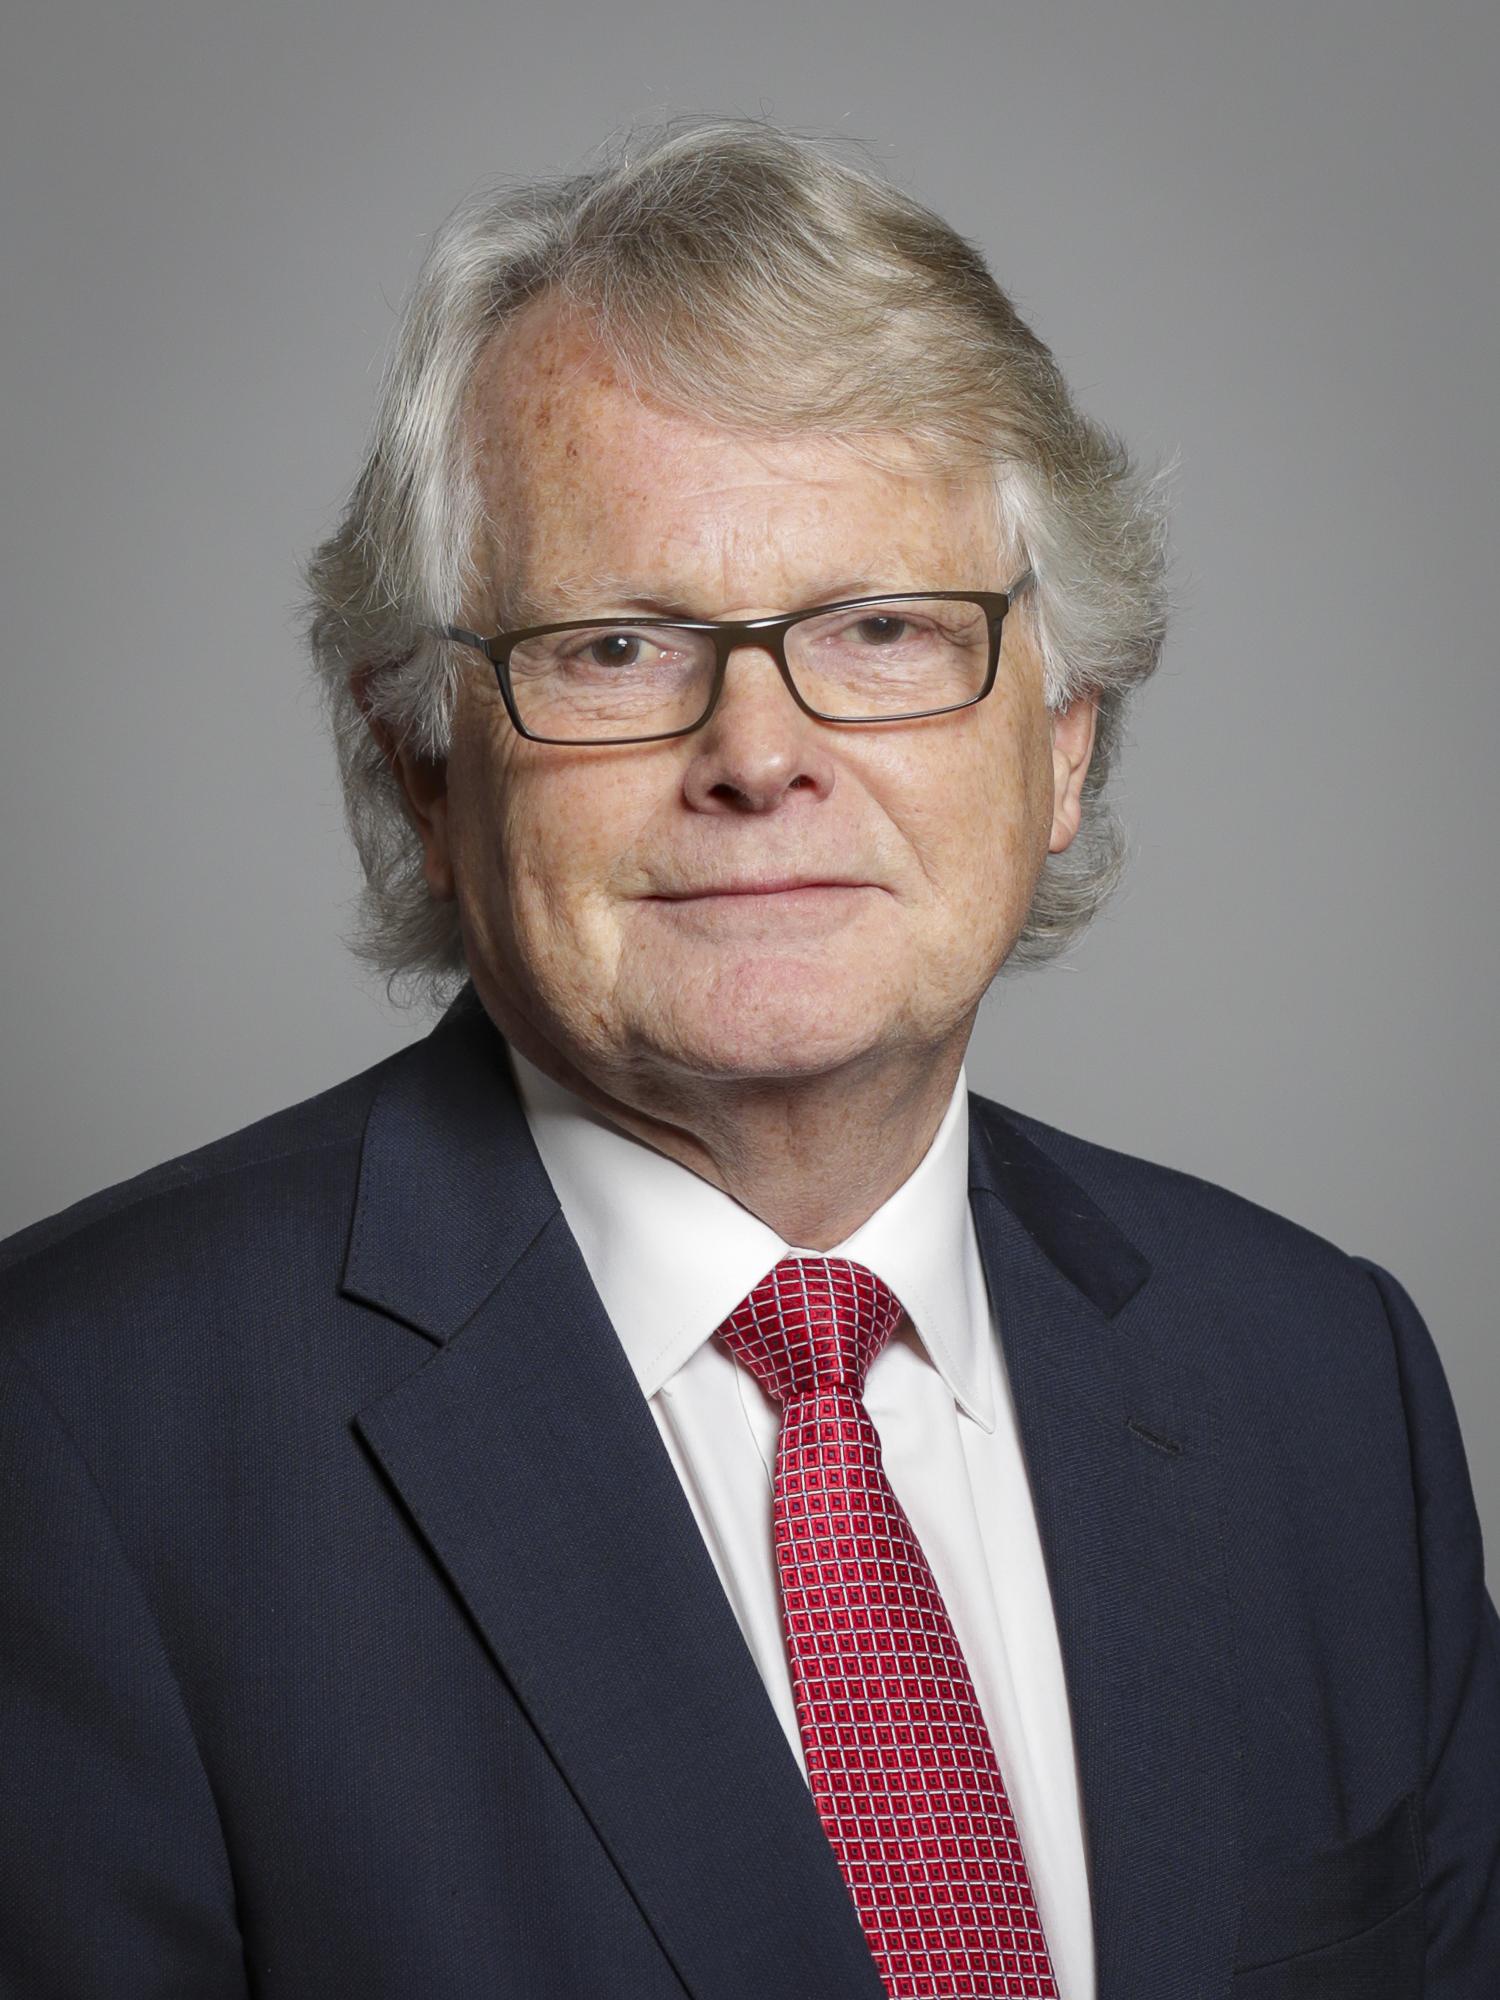 Michael Dobbs